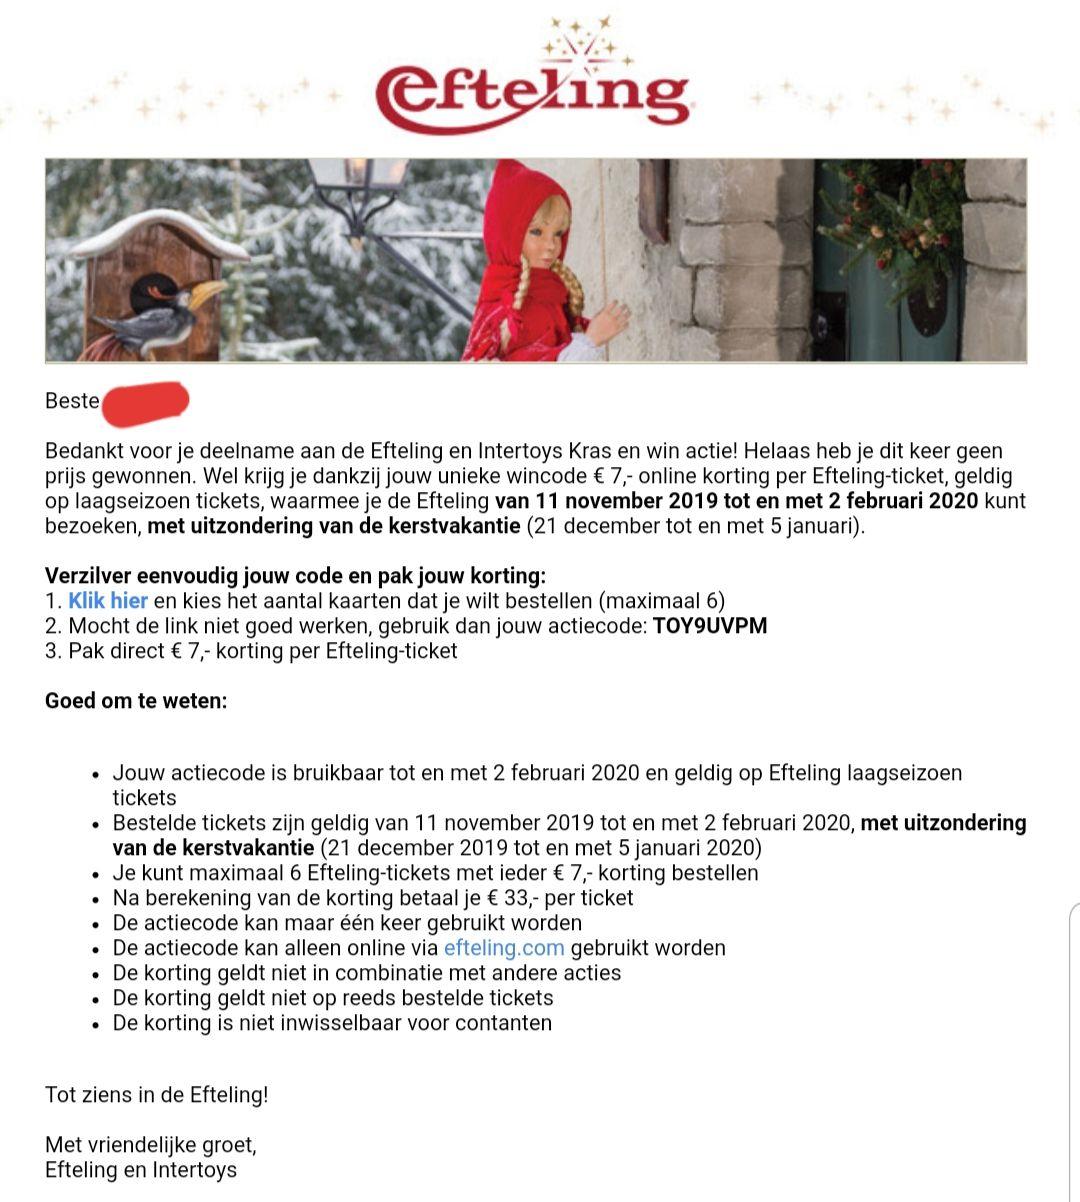 7€ korting per Efteling Ticket